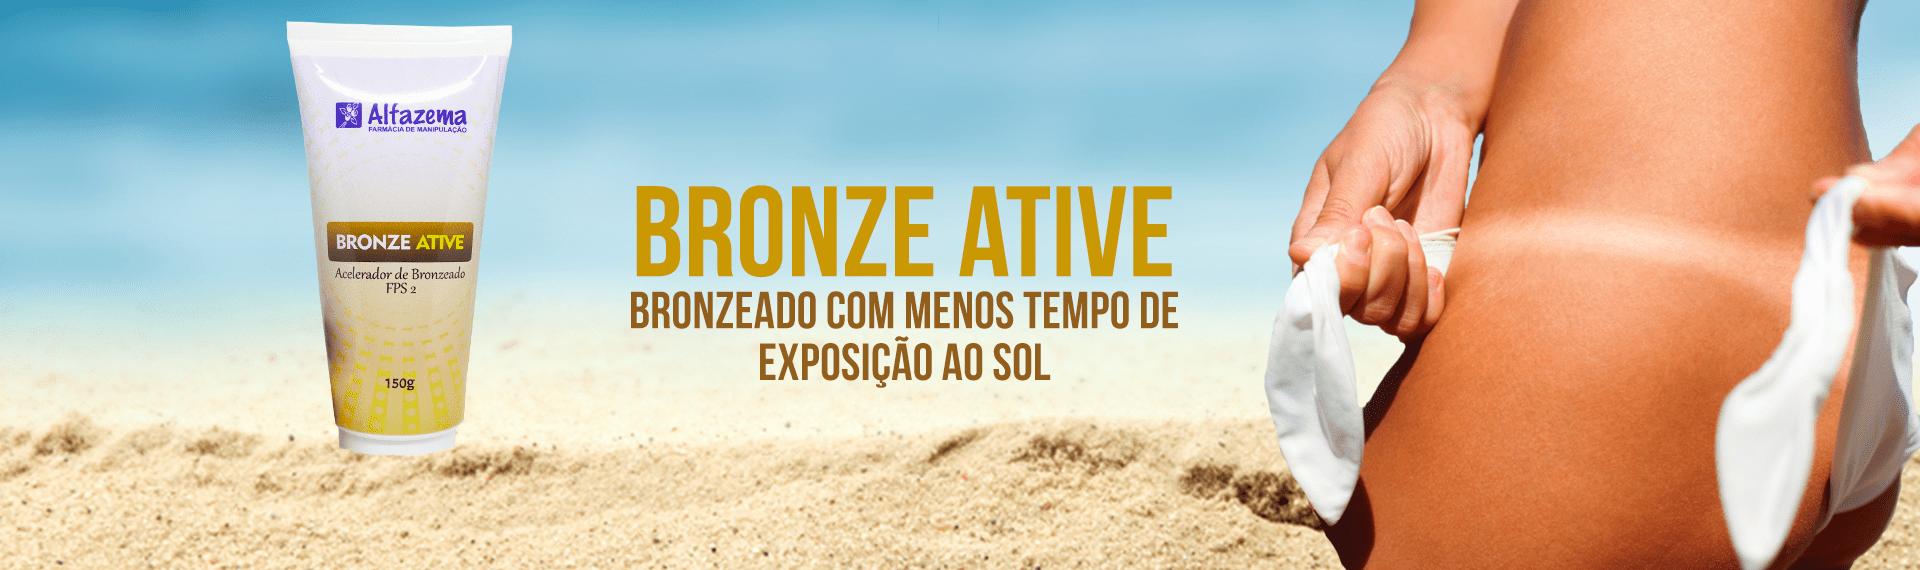 Bronze ative